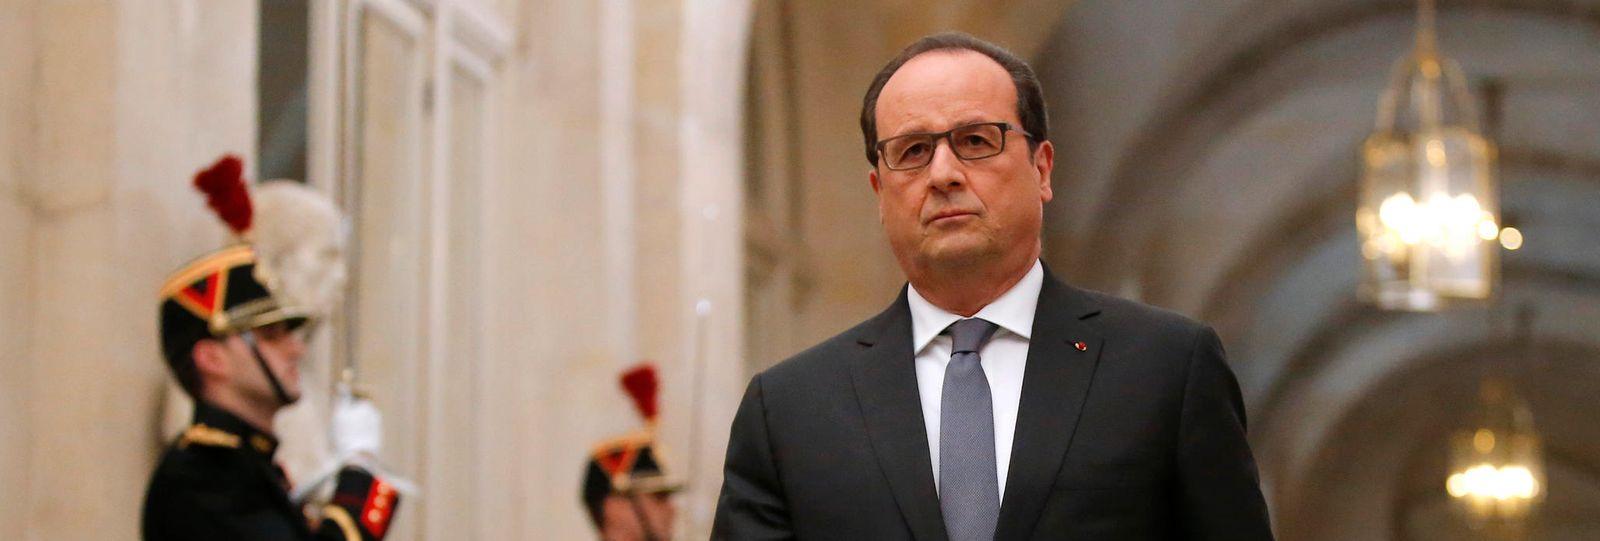 Hollande Frankreich